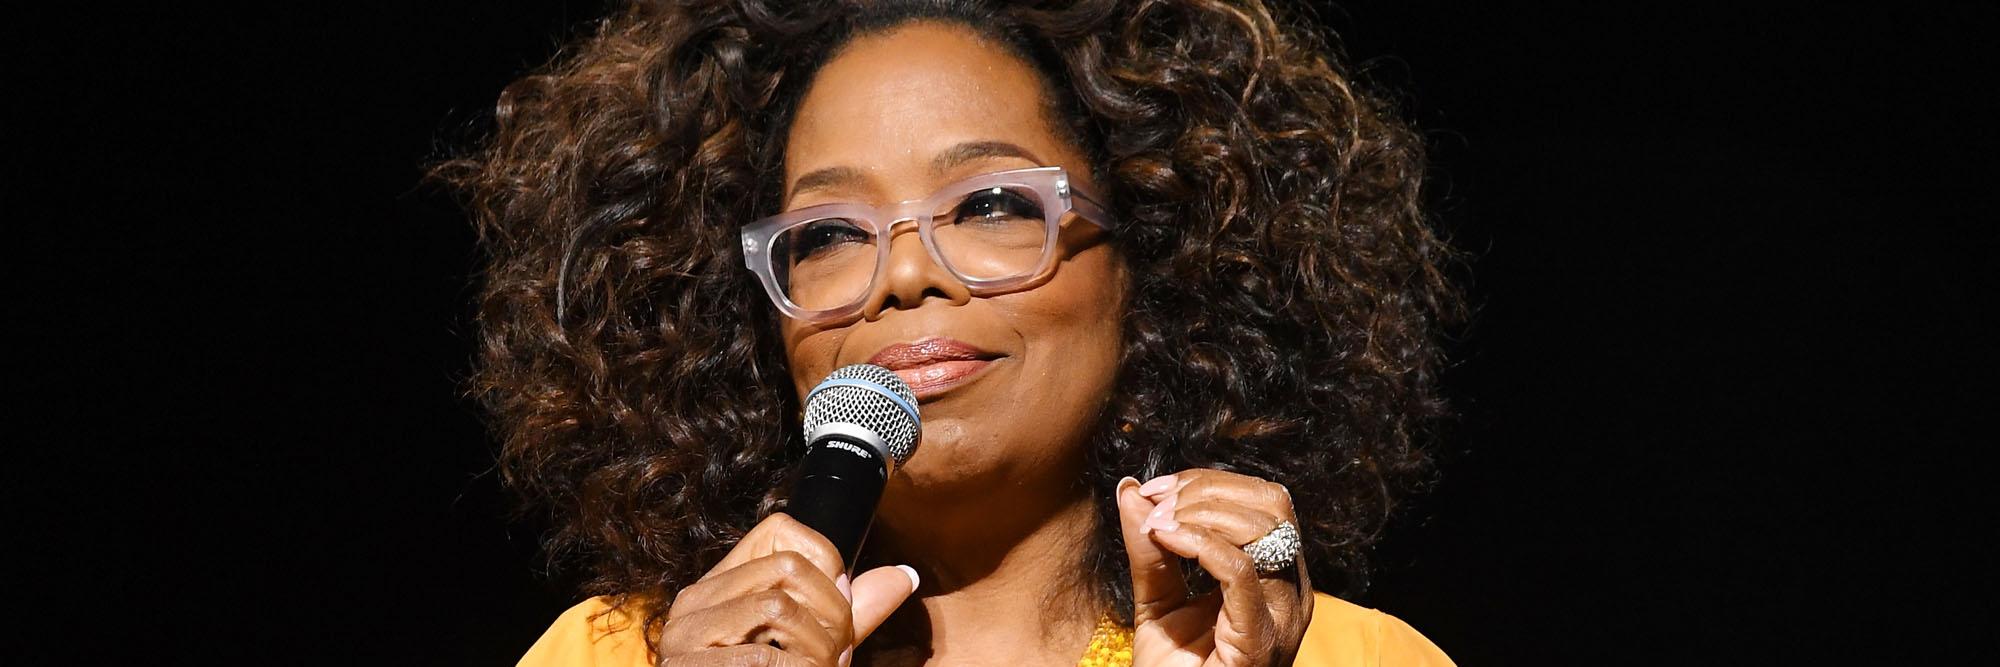 Oprah Donates $10 Million Towards COVID-19 Relief Efforts